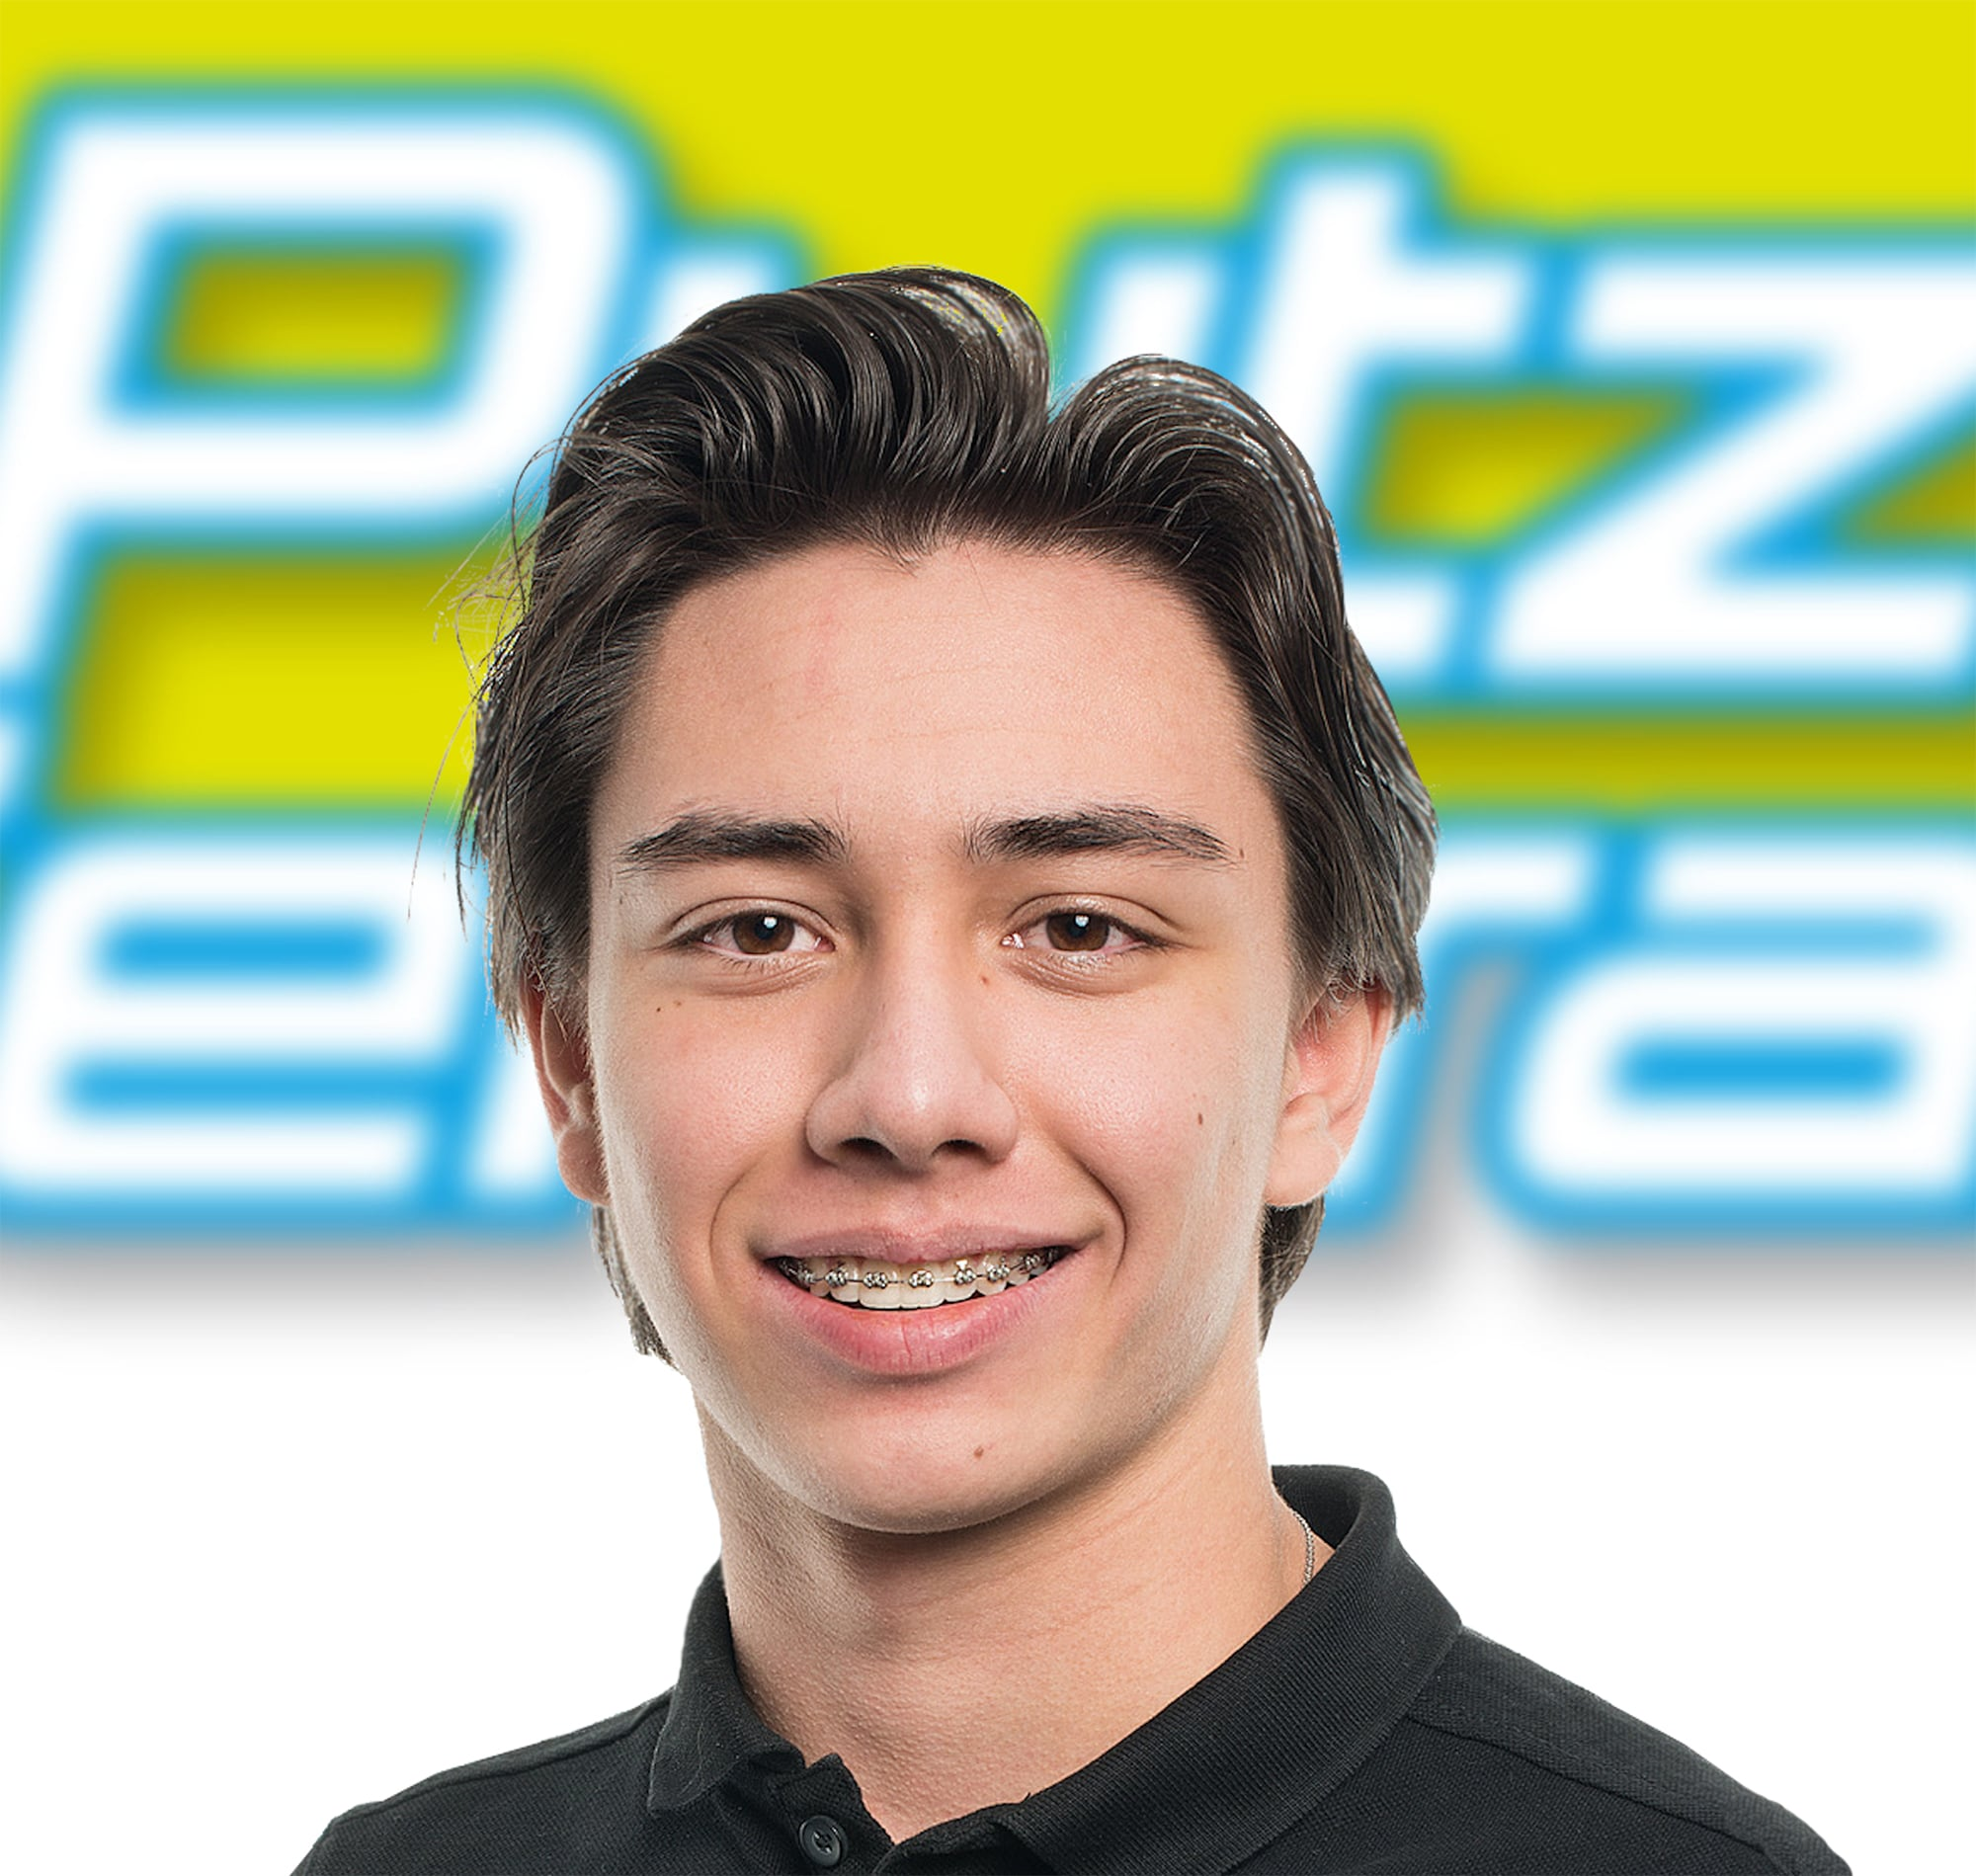 Putzzentrale | Jack Meier |Team Zürich